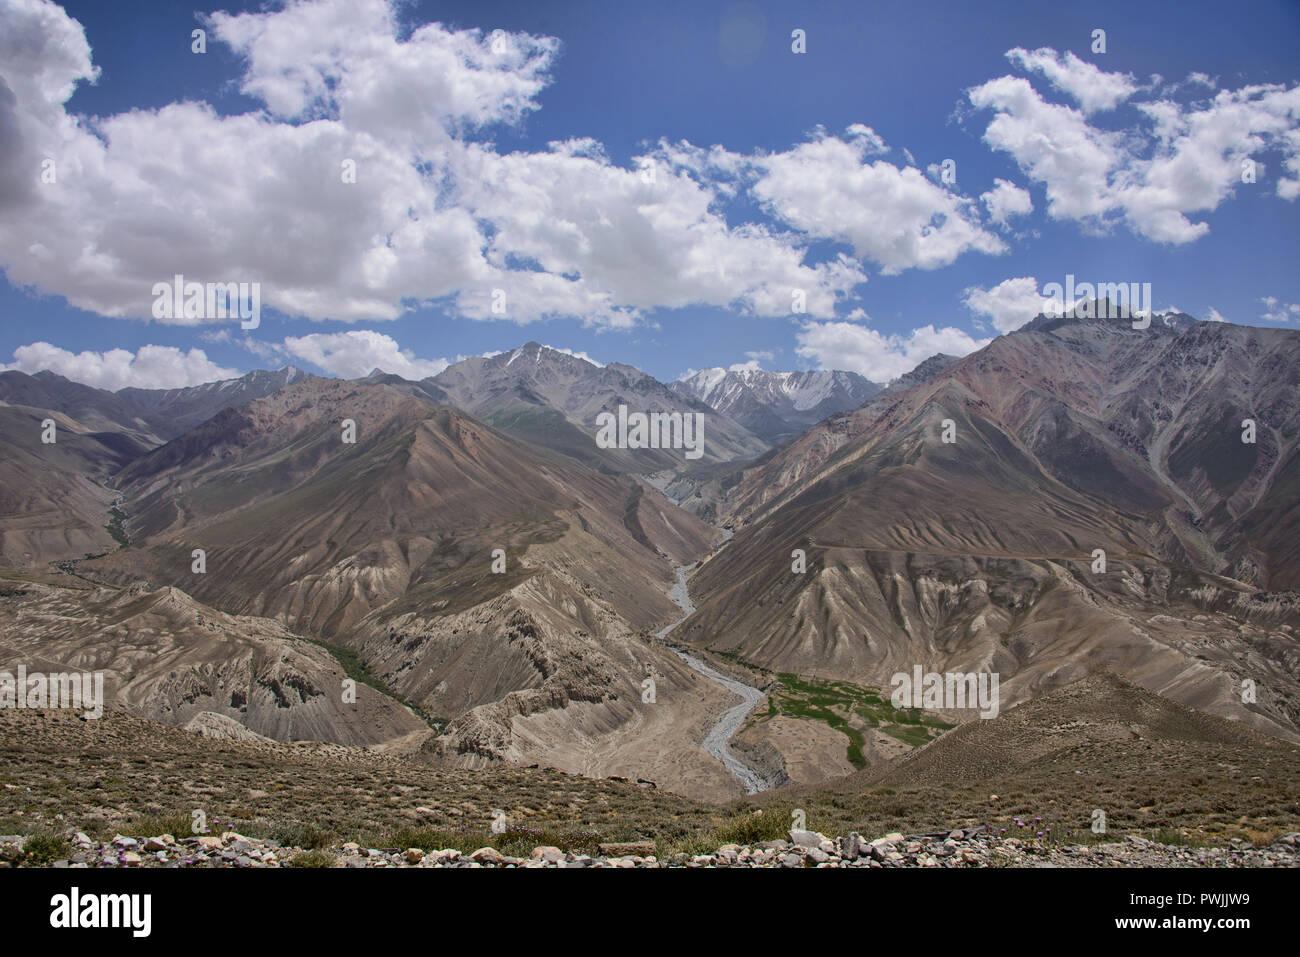 Looking into the Wakhan Valley and Afghanistan Hindu Kush, Langar, Tajikistan - Stock Image